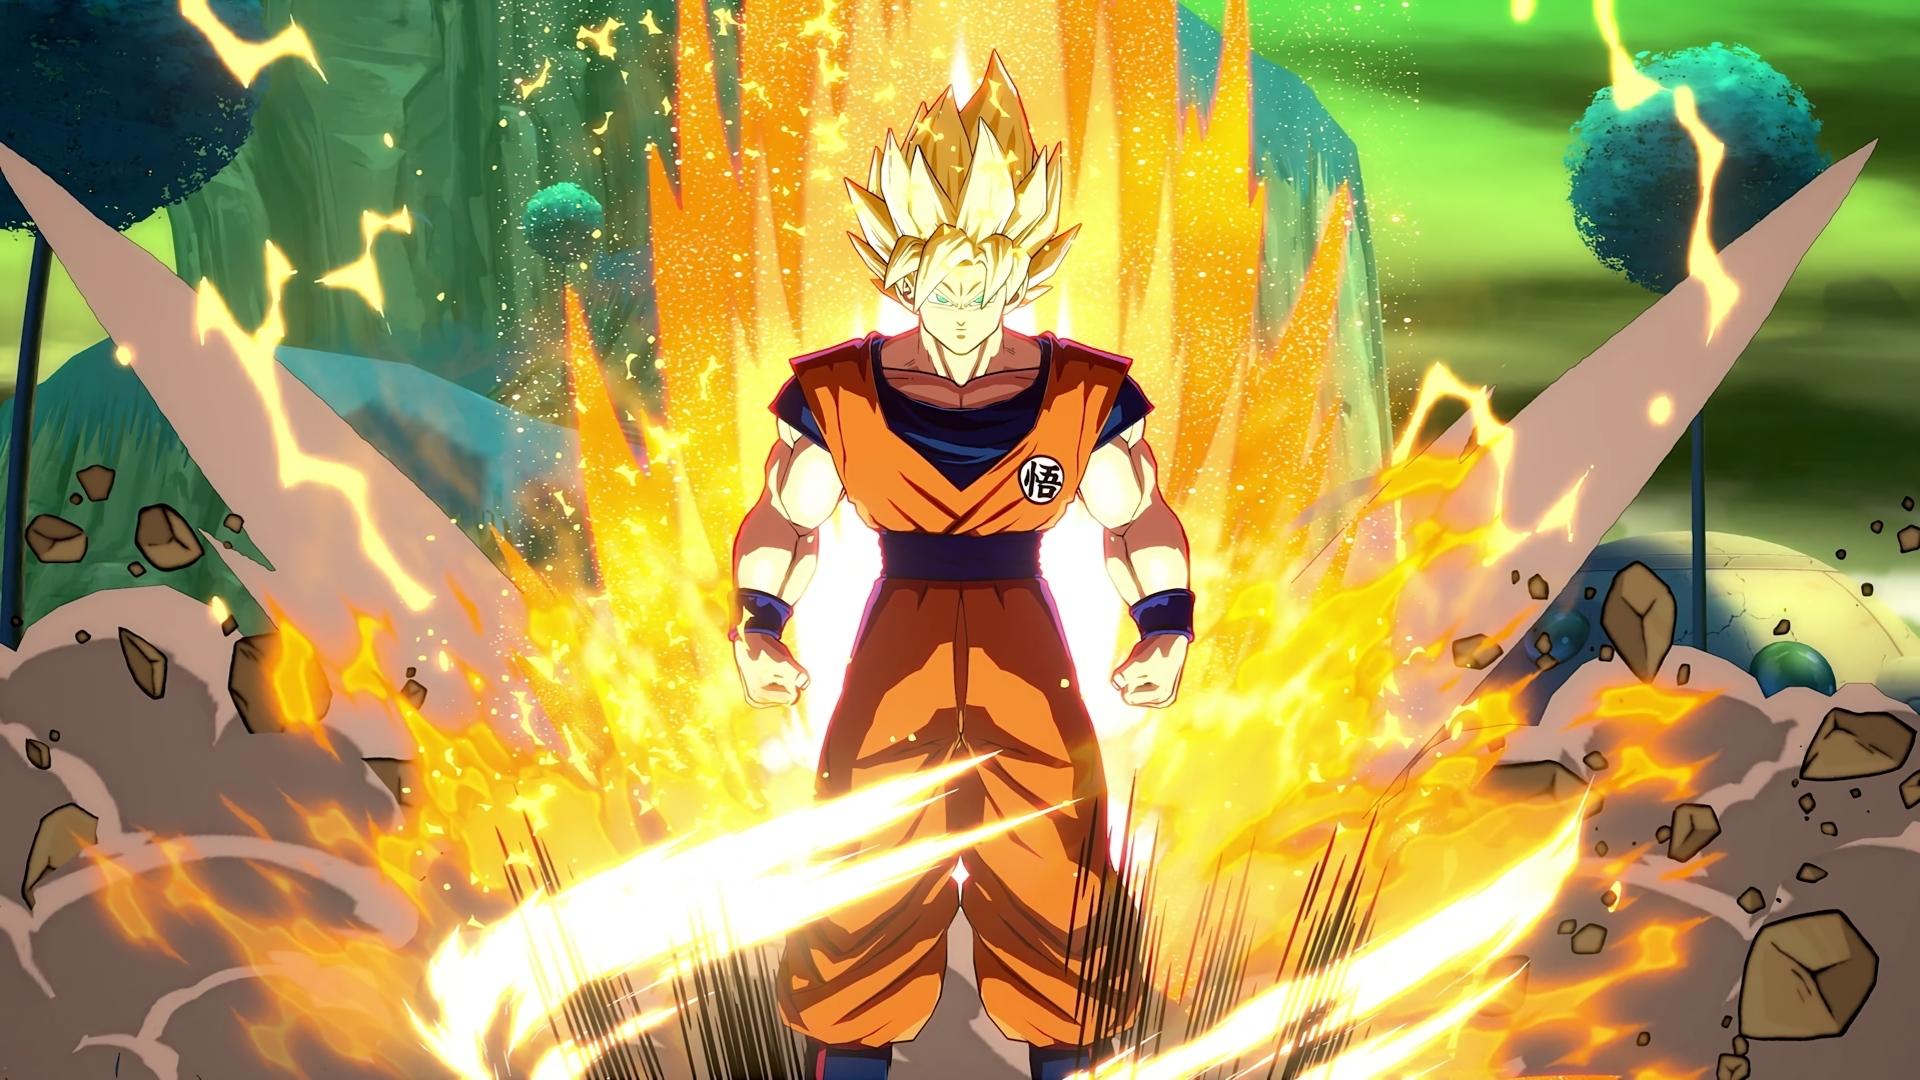 Goku HD Wallpaper | Background Image | 1920x1080 | ID ...